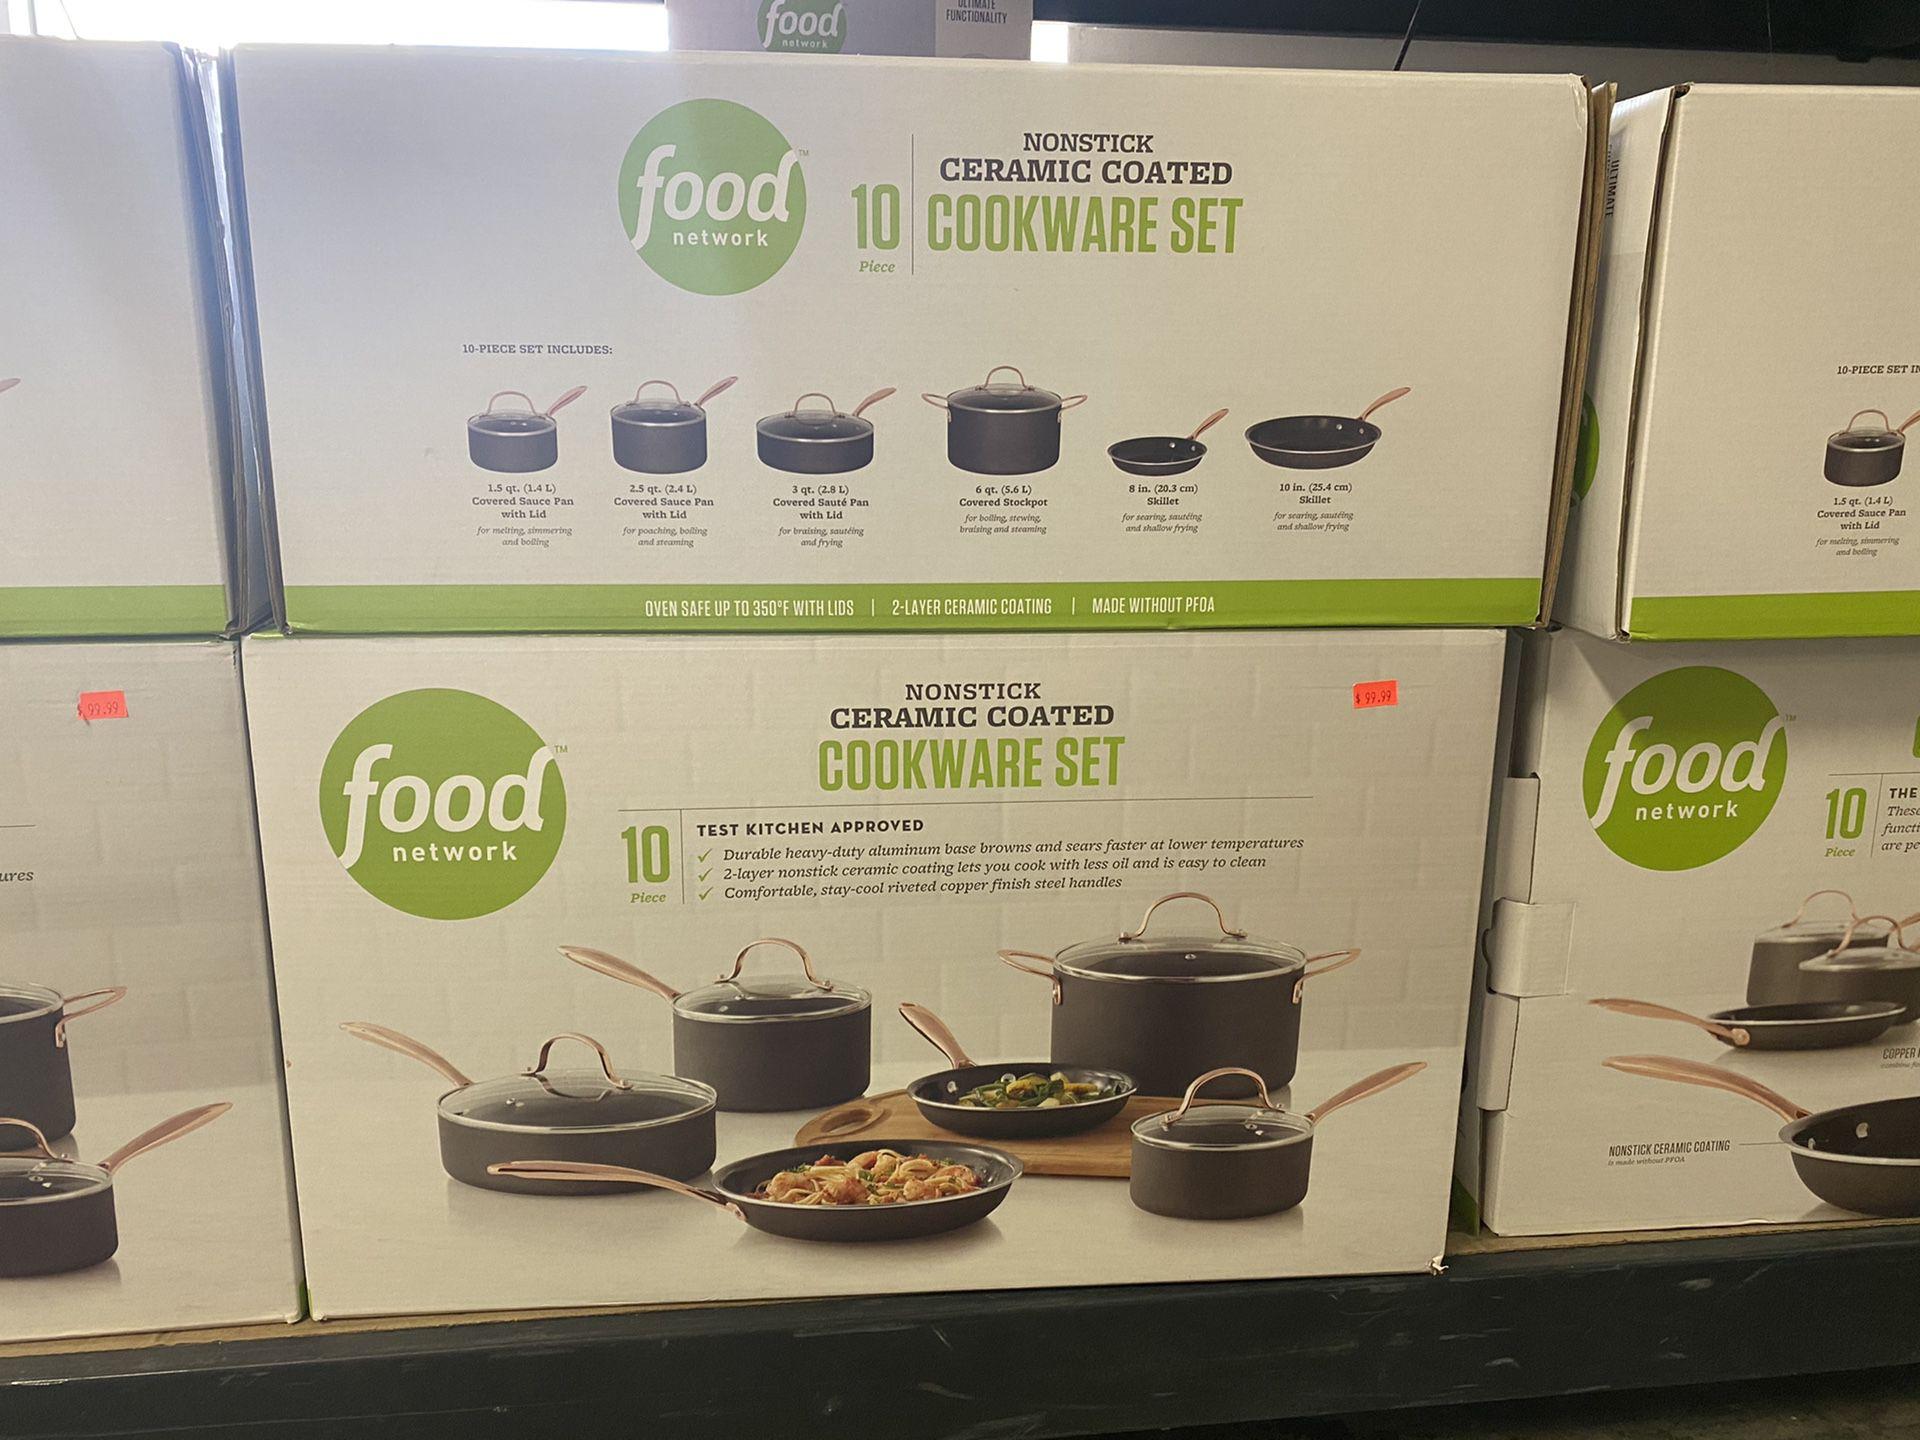 Food Network Nonstick Ceramic Coated 10 PCS Cookware Set New!!! $99.99!